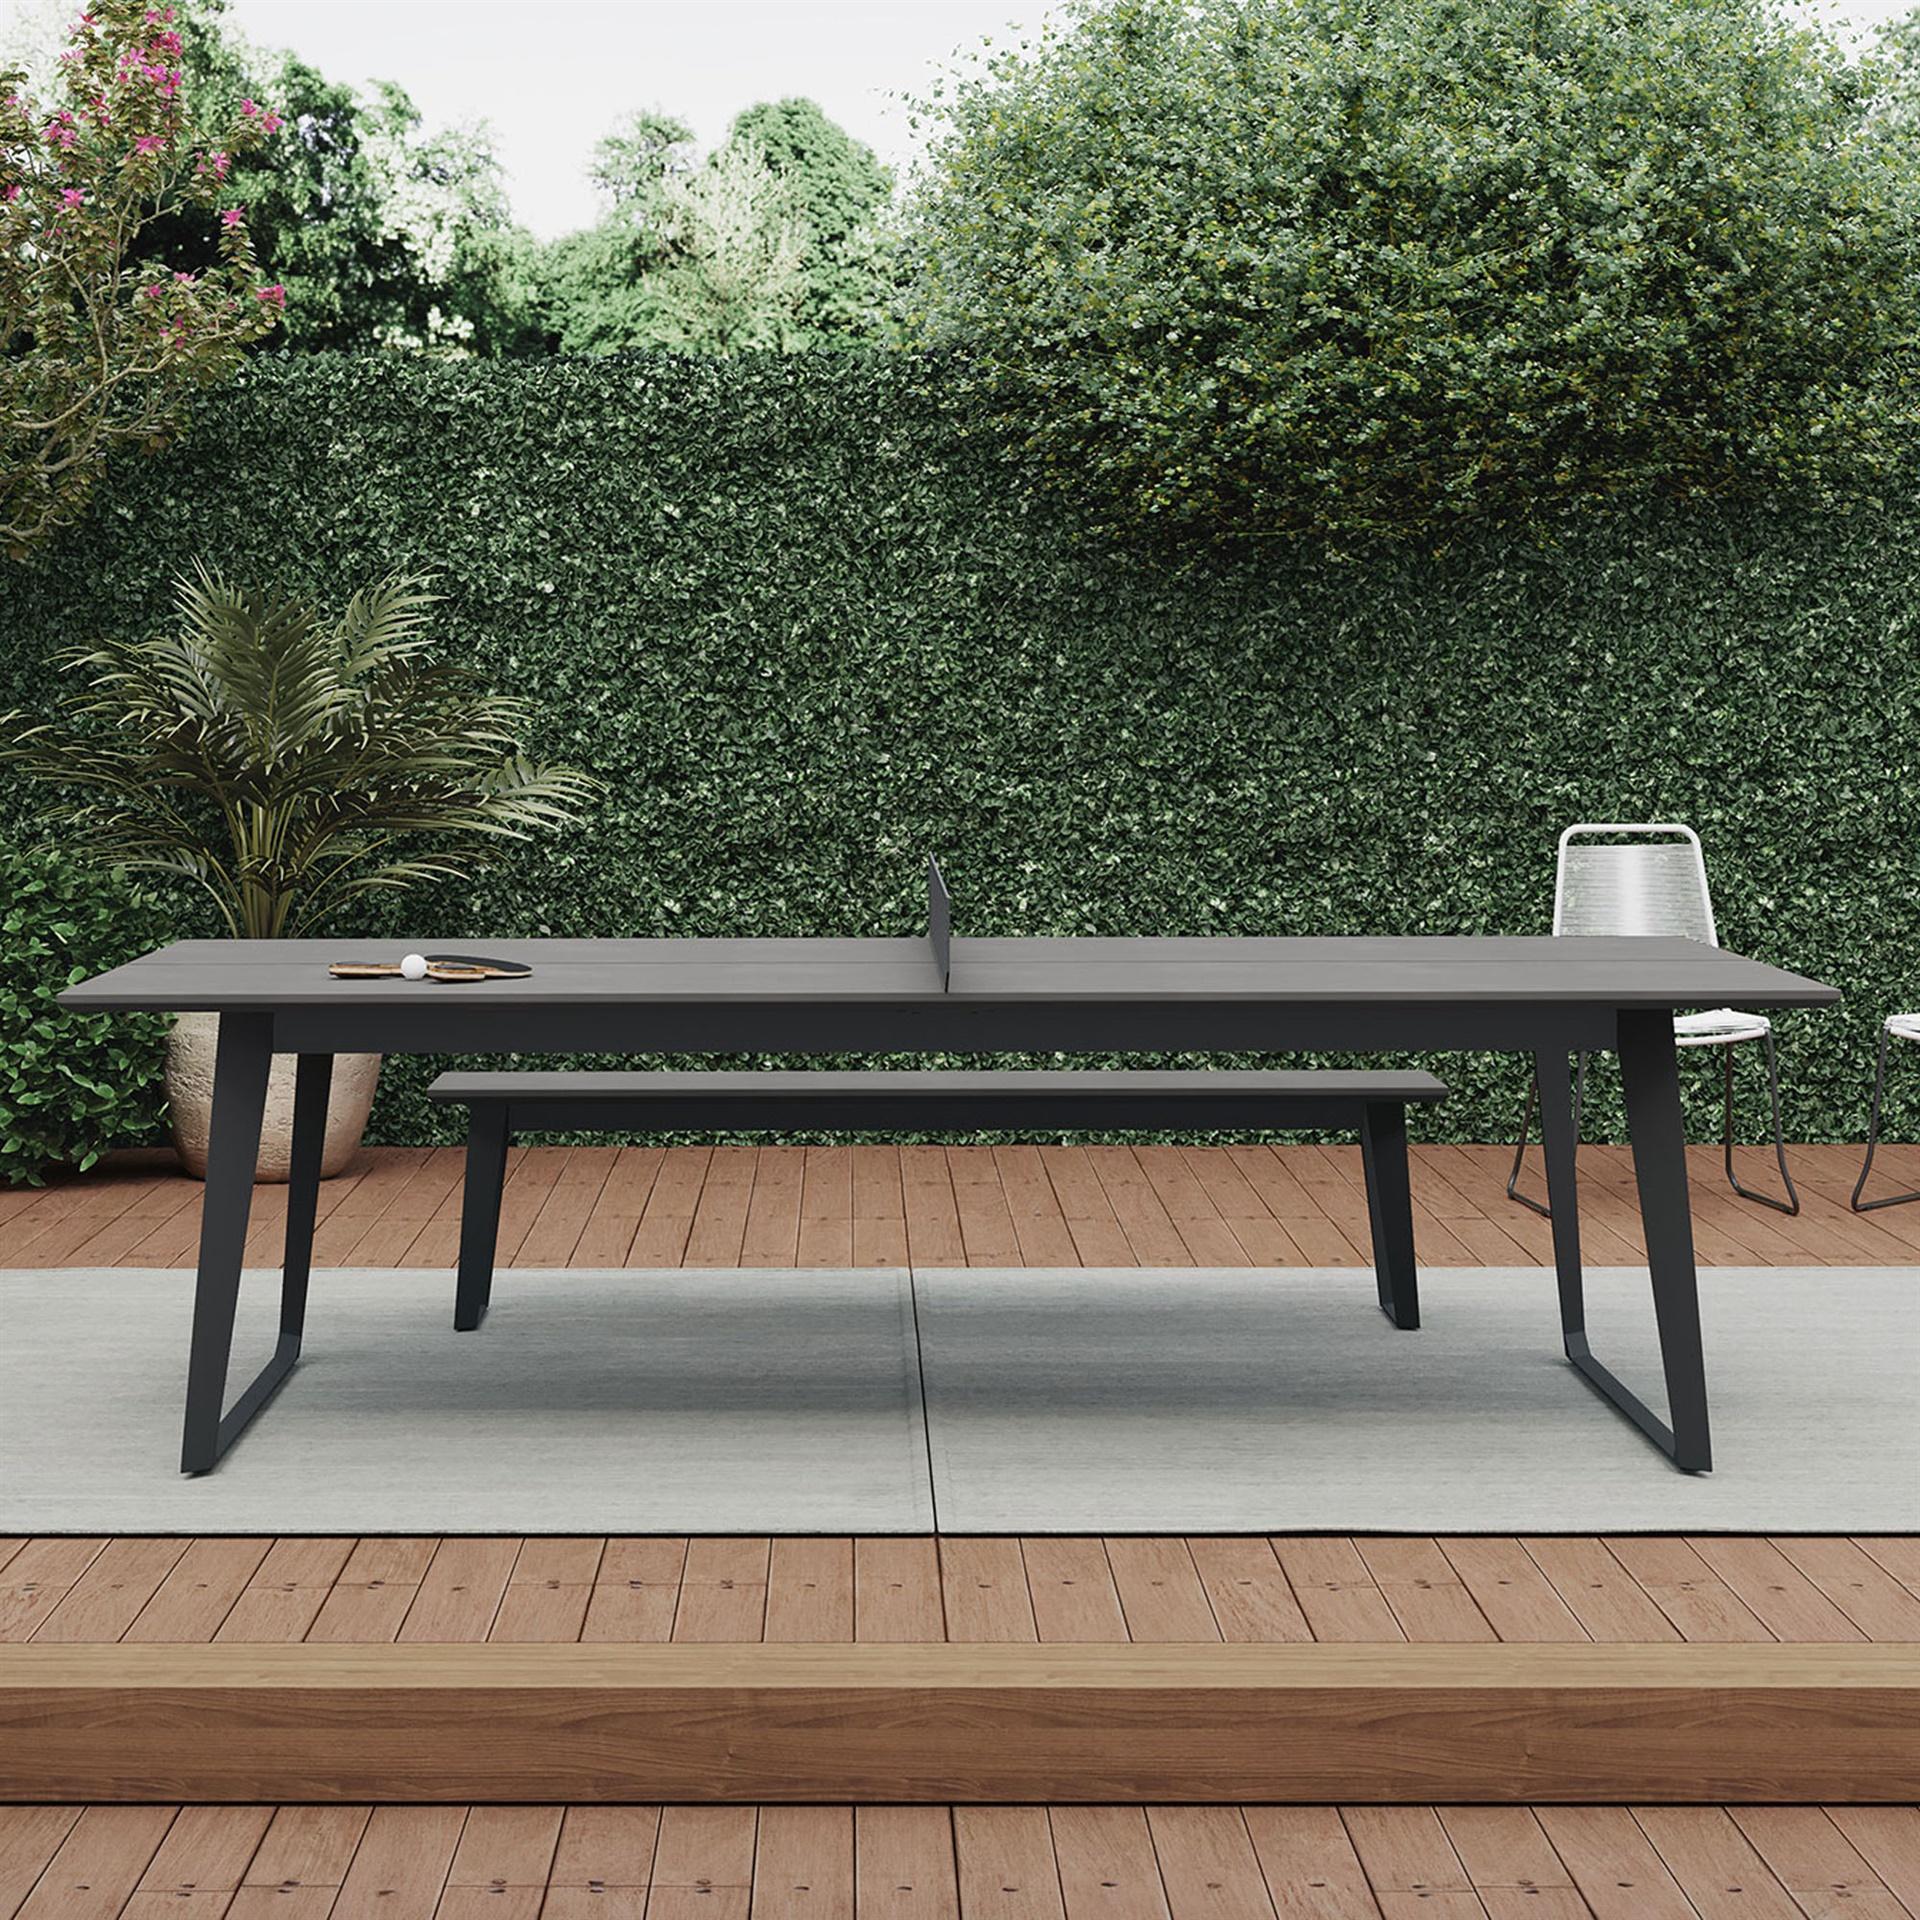 Tremendous Amsterdam Outdoor Ping Pong Table Spiritservingveterans Wood Chair Design Ideas Spiritservingveteransorg